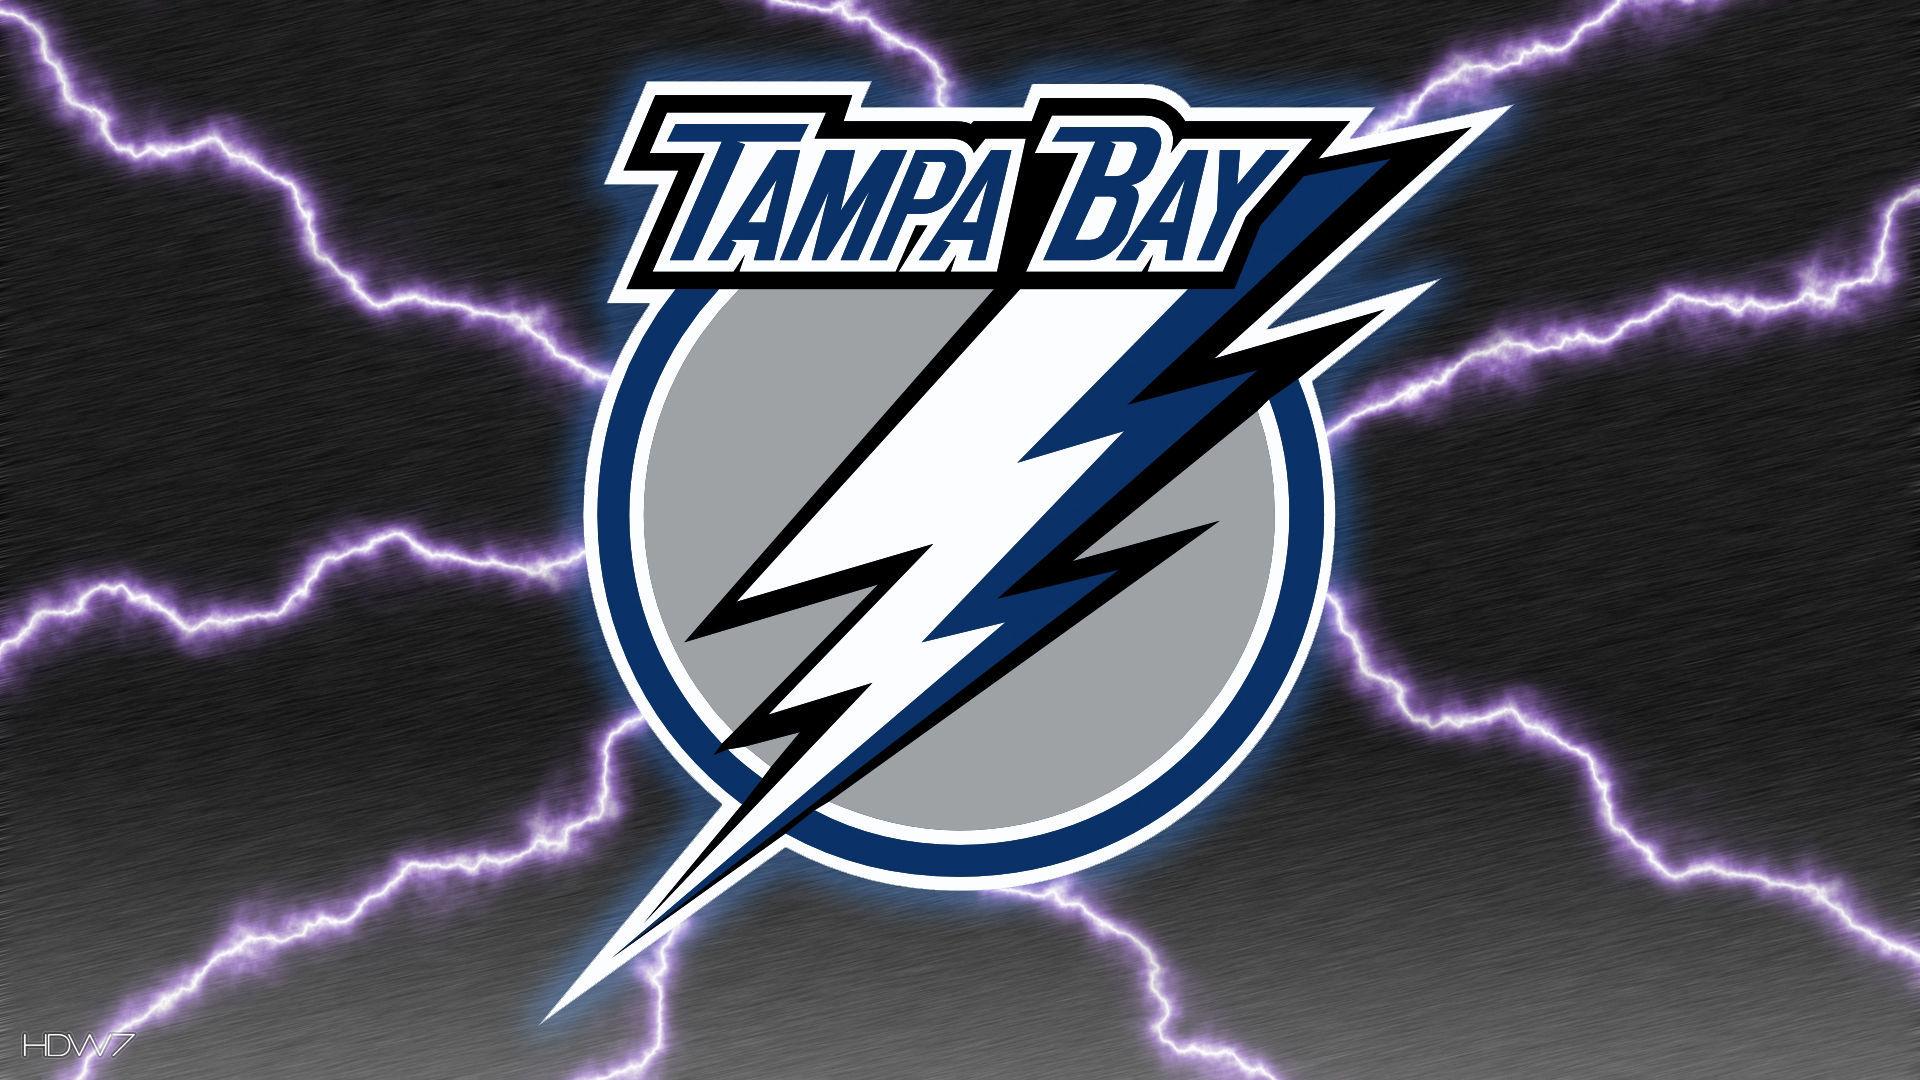 Tampa Bay Rays Hd Wallpaper Tampa Bay Lightning Cover 1262283